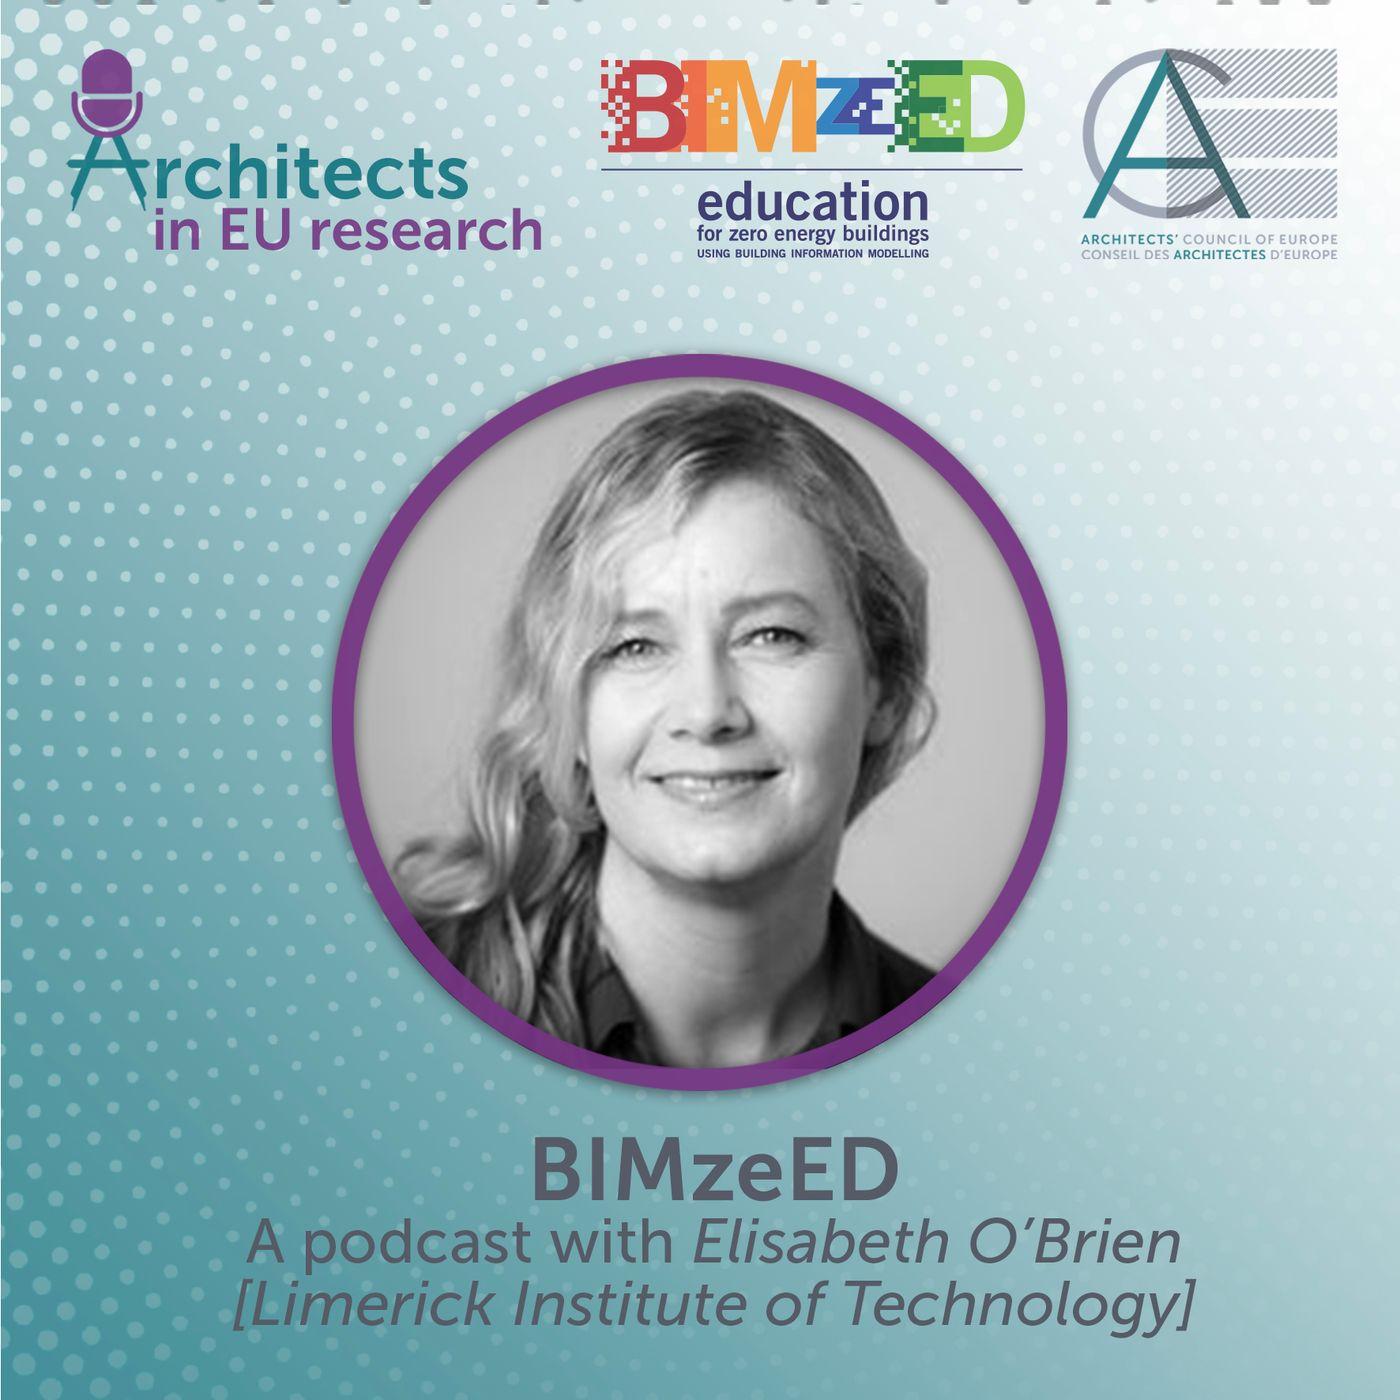 BIMzeED - better employability through nZEB and BIM skills